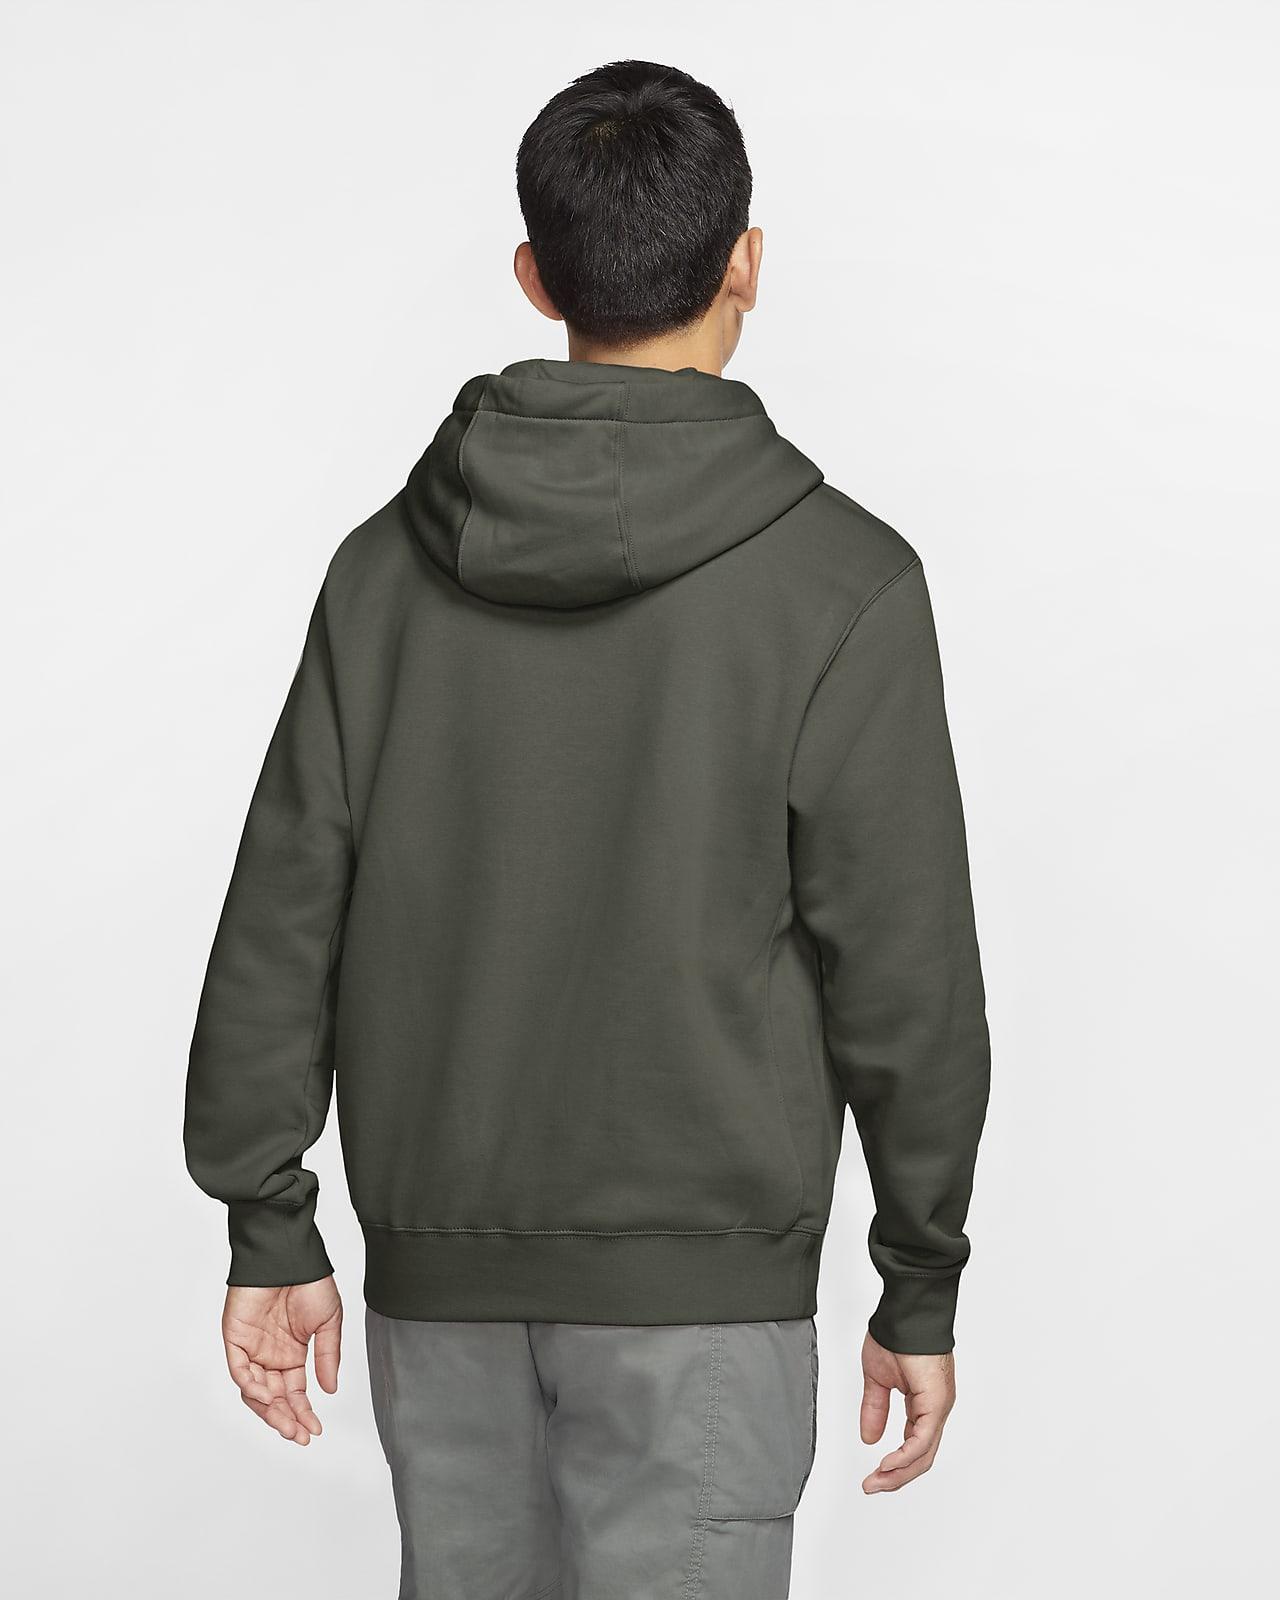 software brindis medio  Nike Sportswear Club Fleece Pullover Hoodie. Nike.com